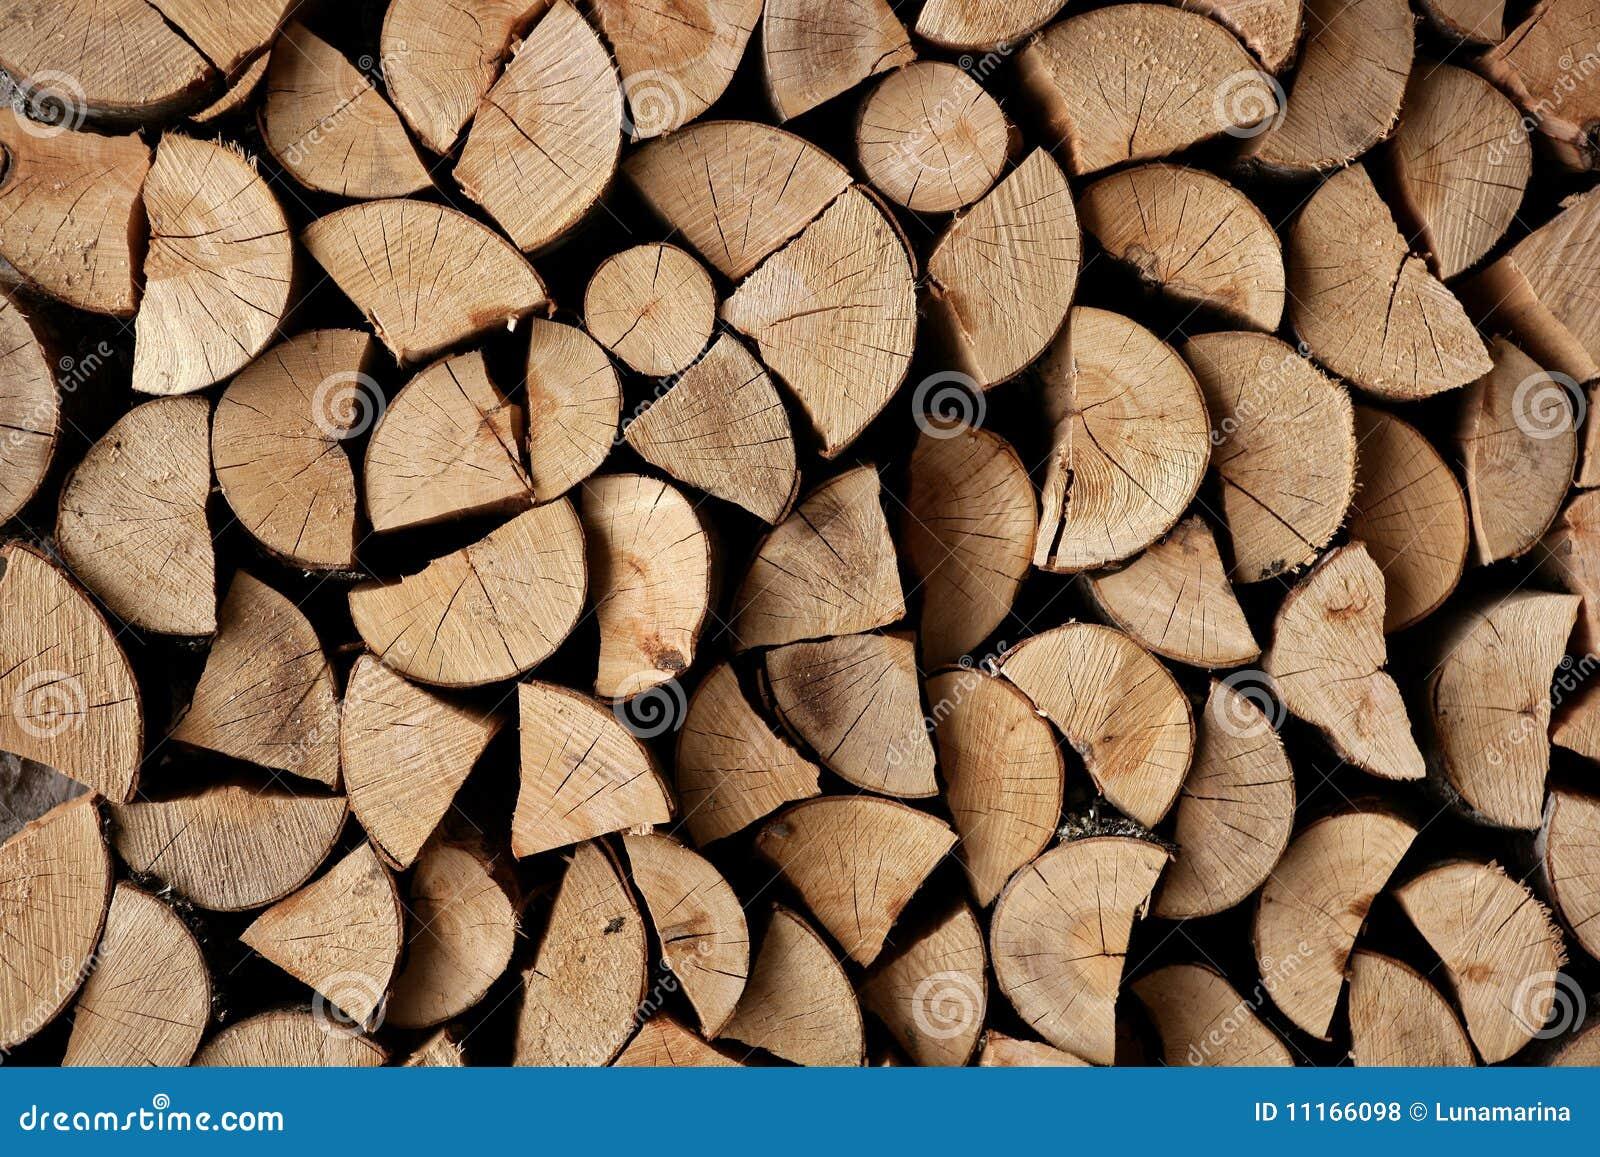 Cut Firewood Stack Logs As Pattern Stock Photo - Image of lumber ...